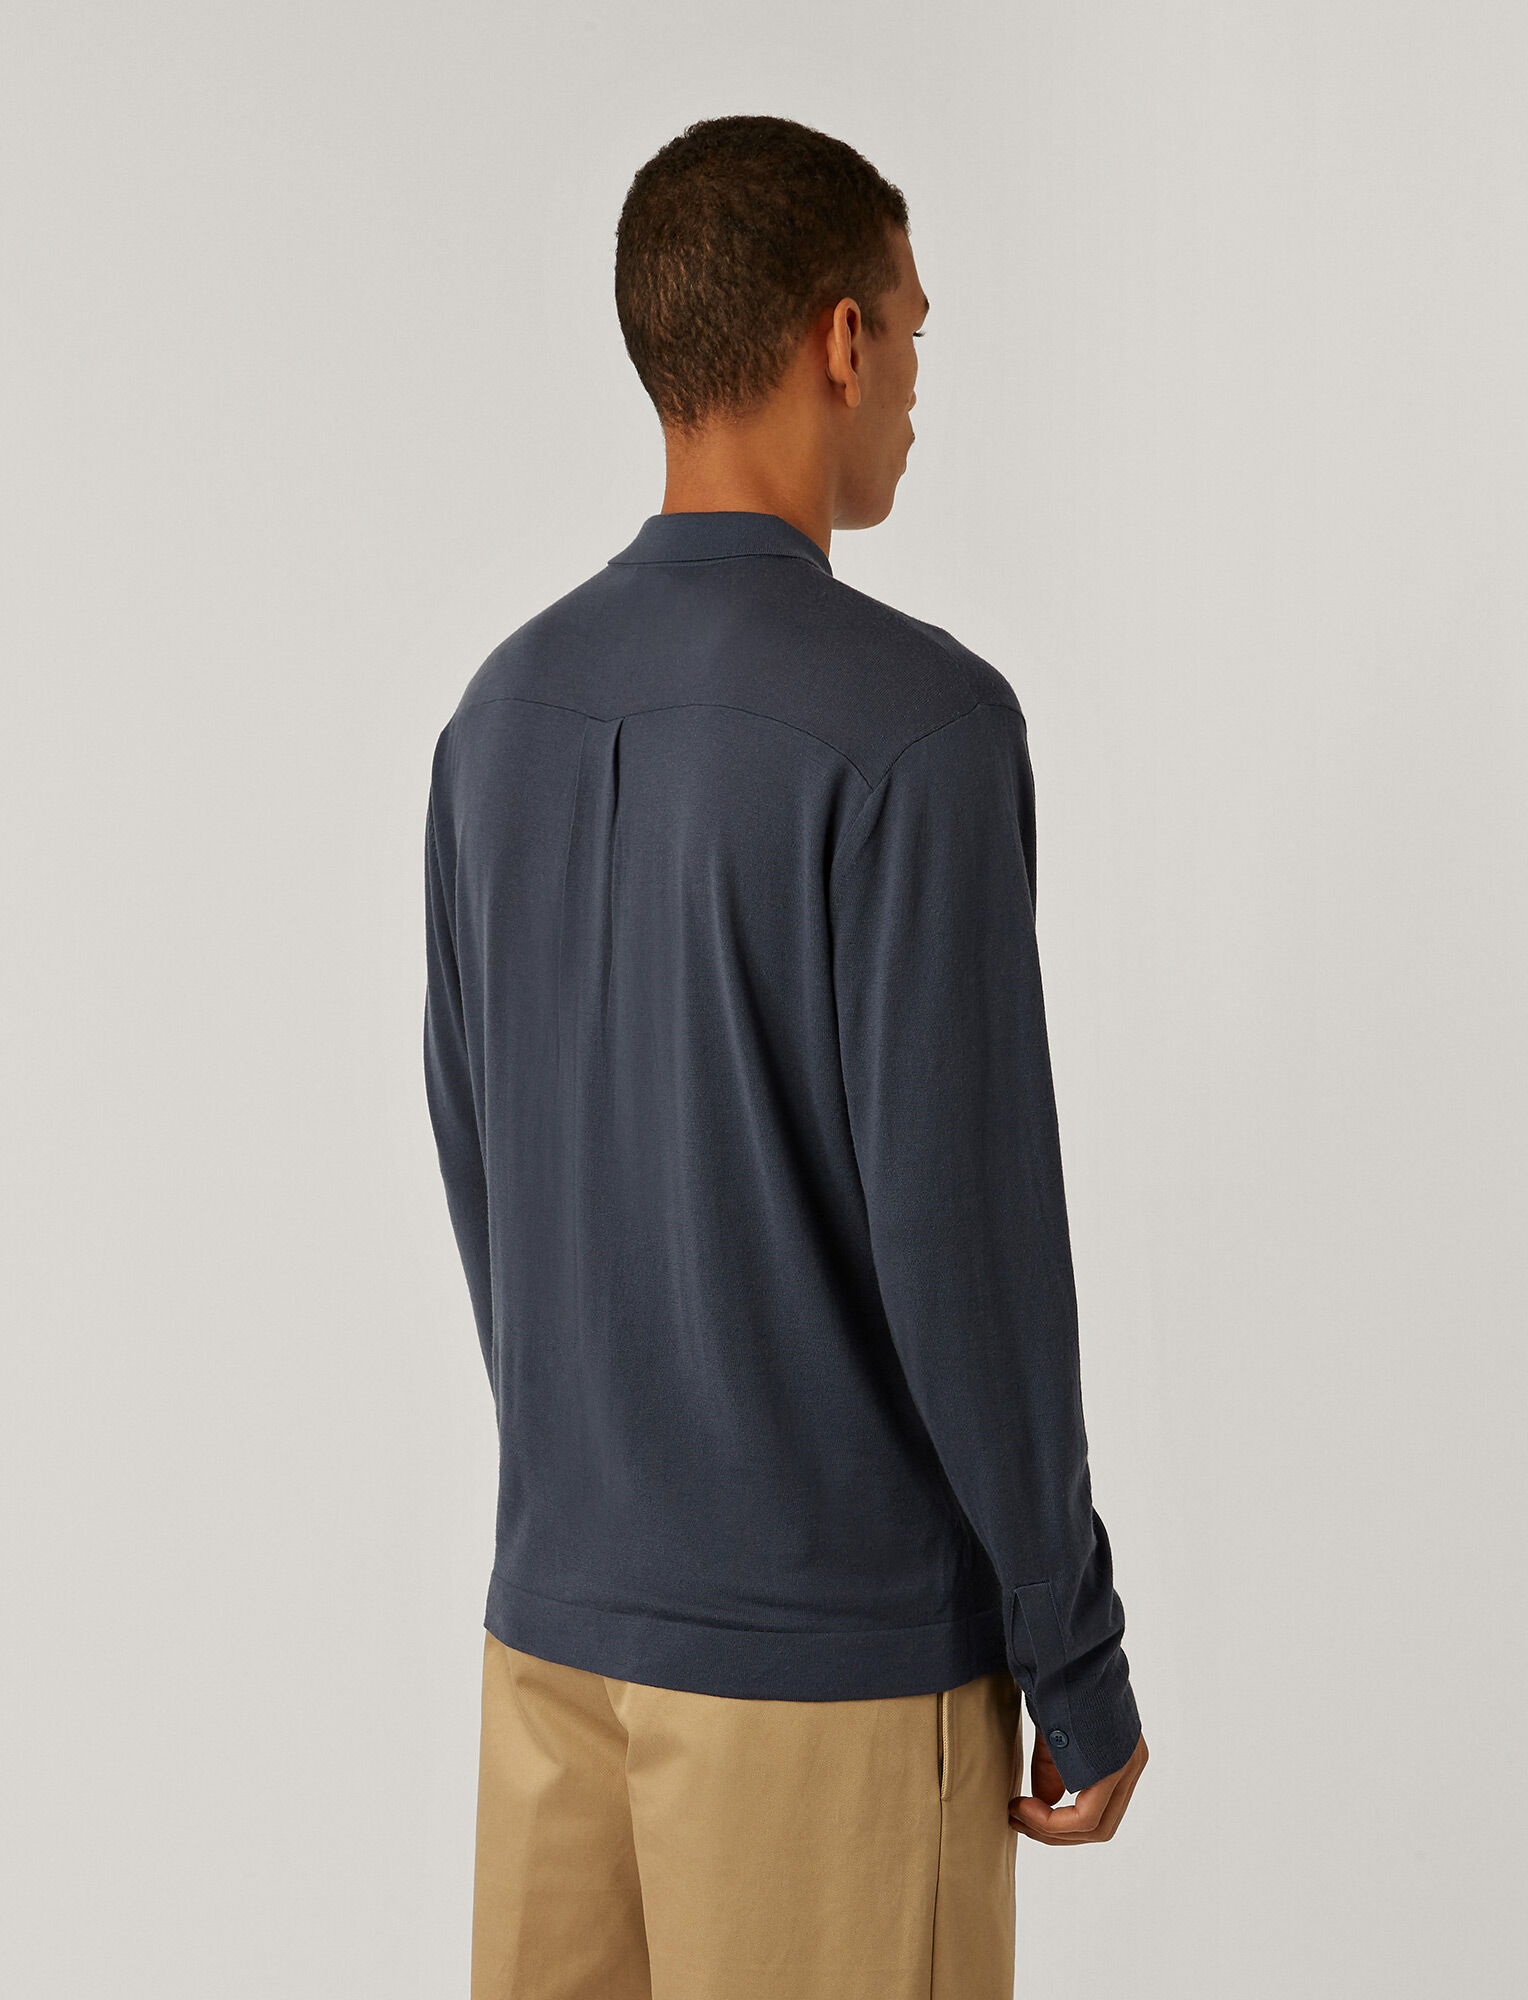 Joseph, Light Merinos Shirt, in BLUE STEEL